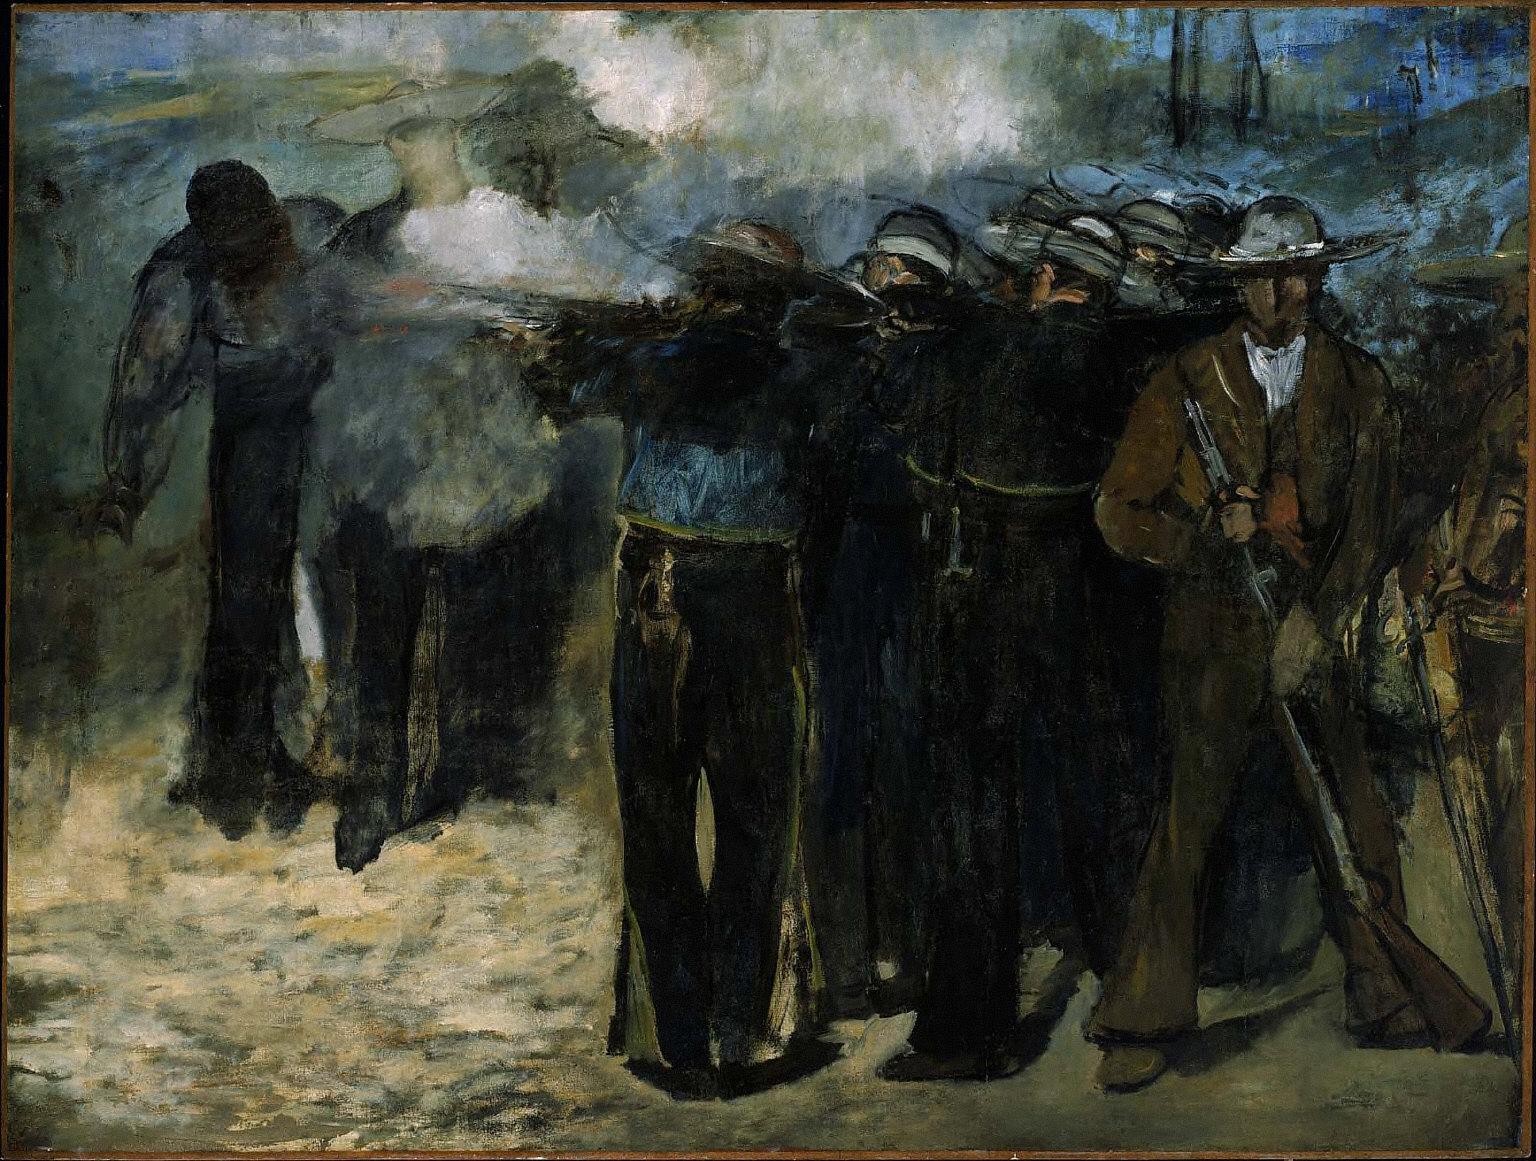 Execution of the Emperor Maximilian